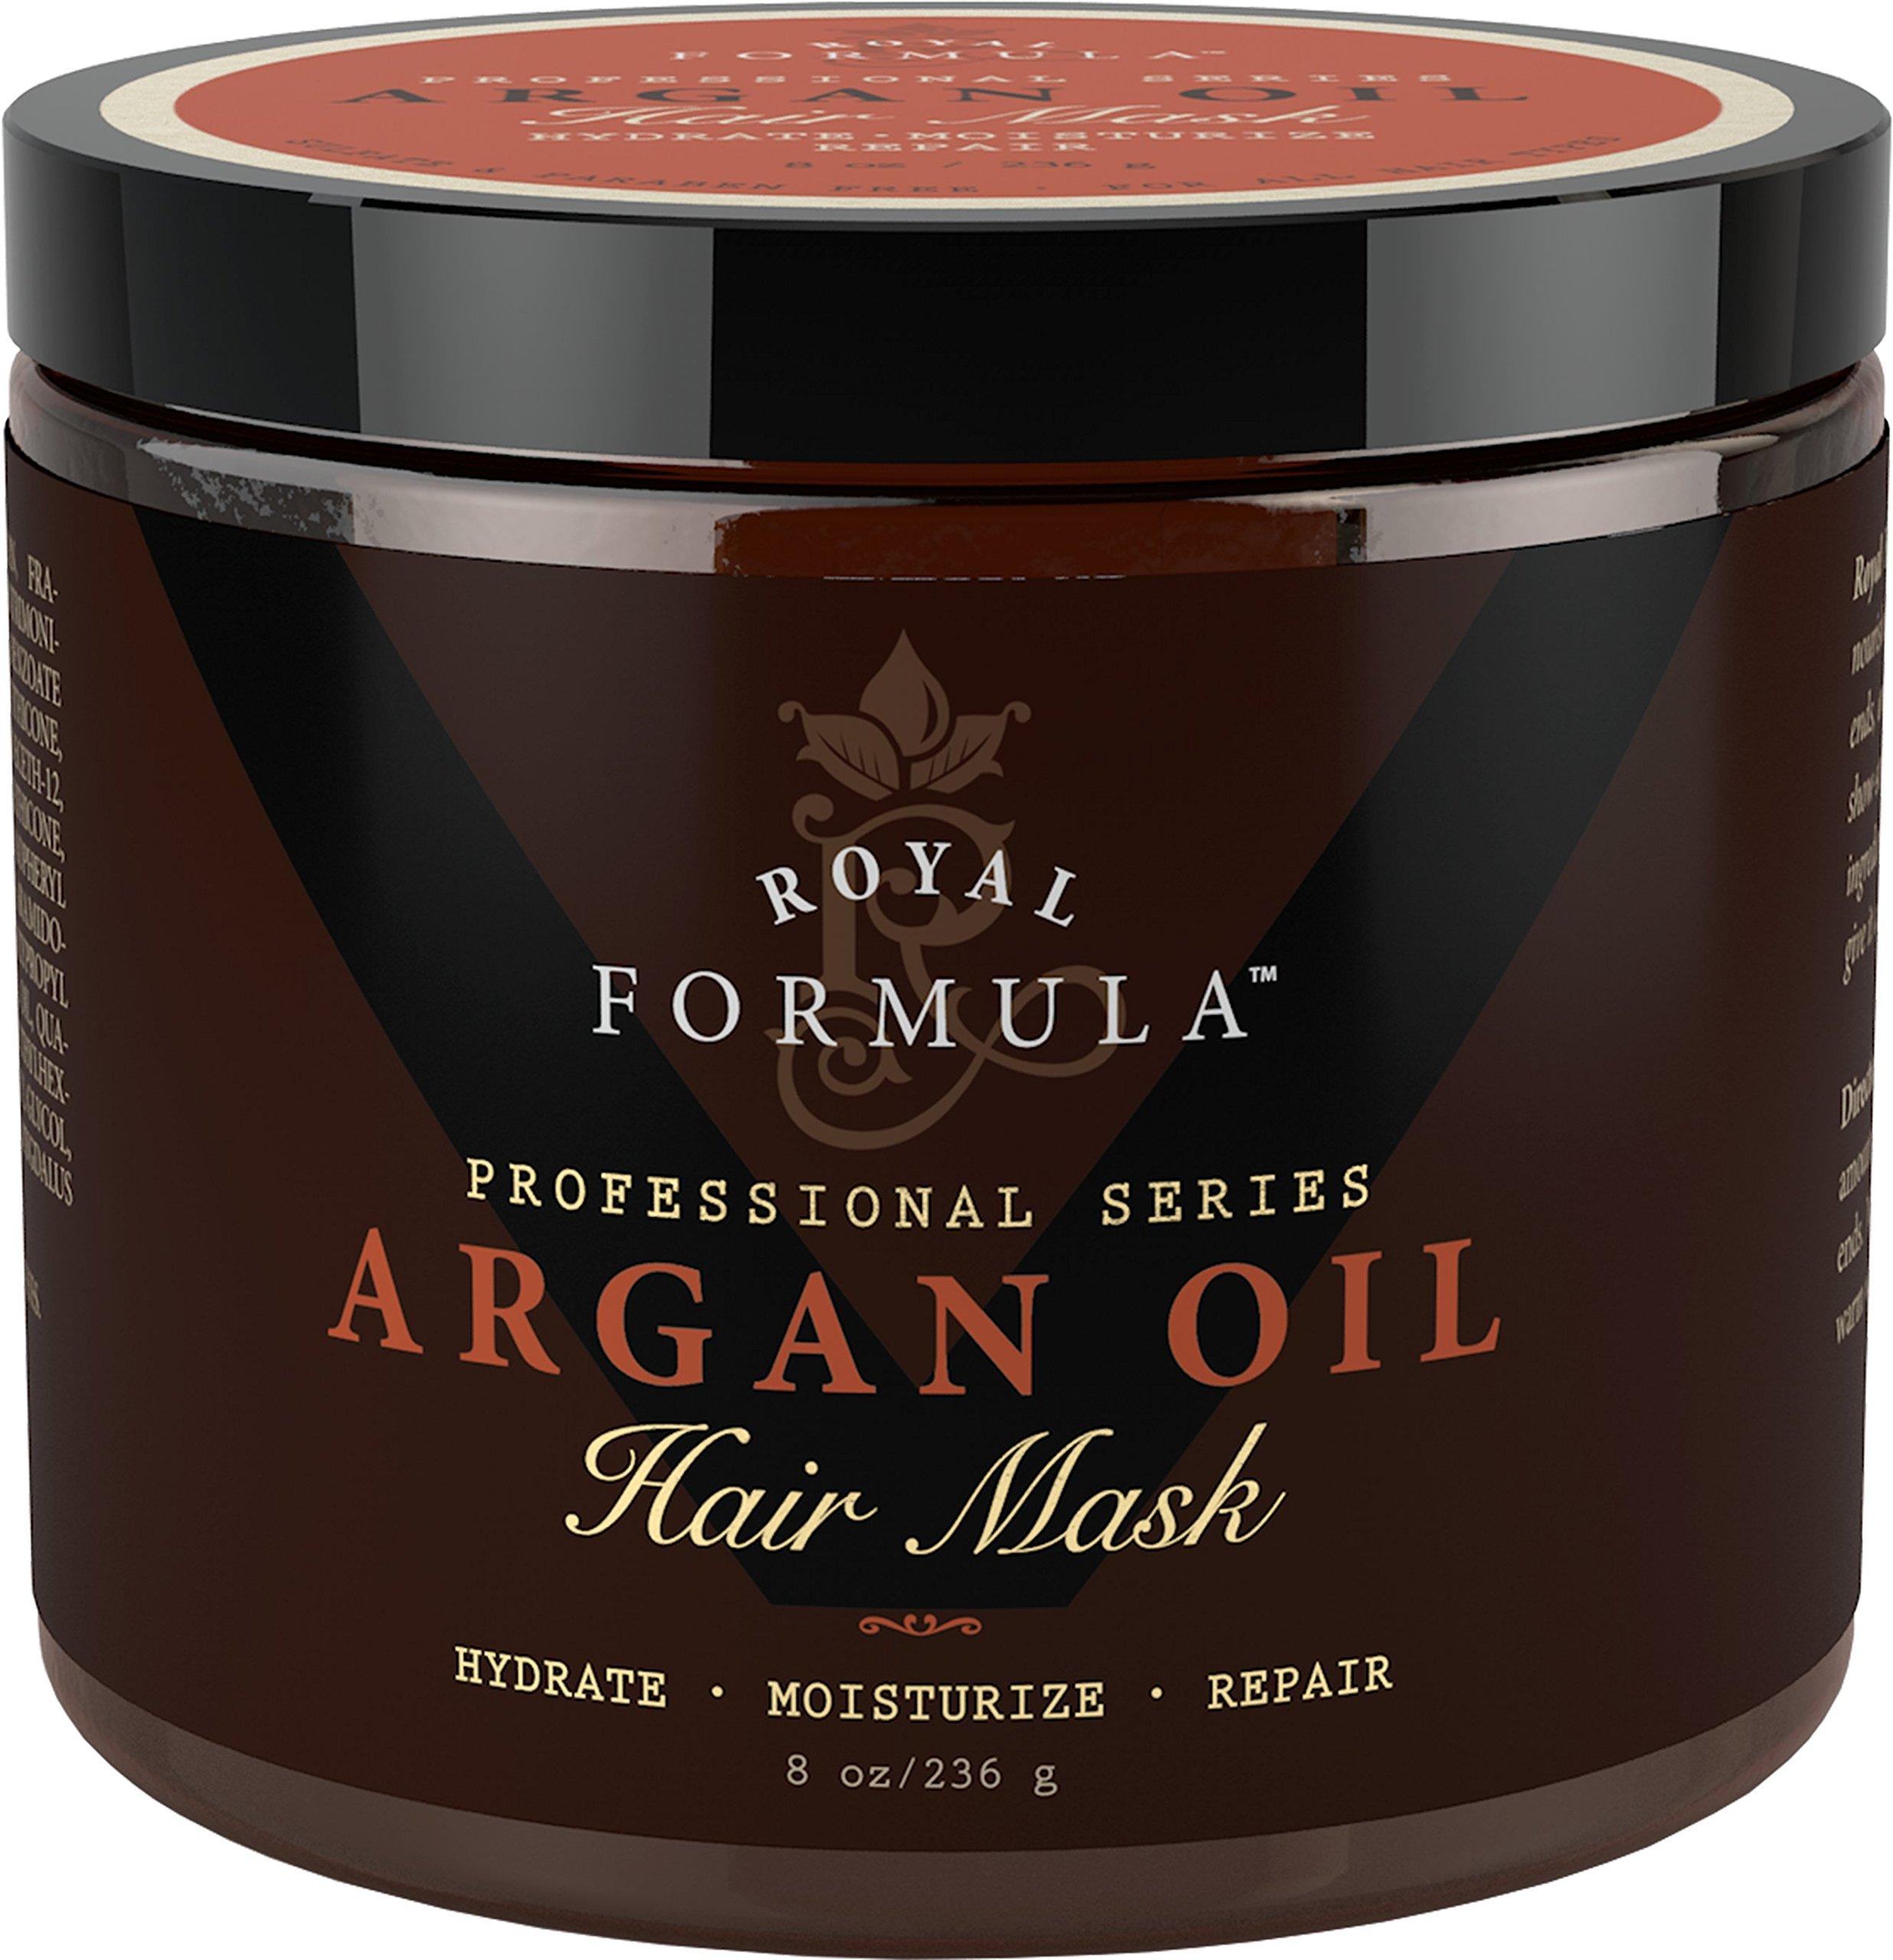 Argan Oil Hair Mask ORGANIC